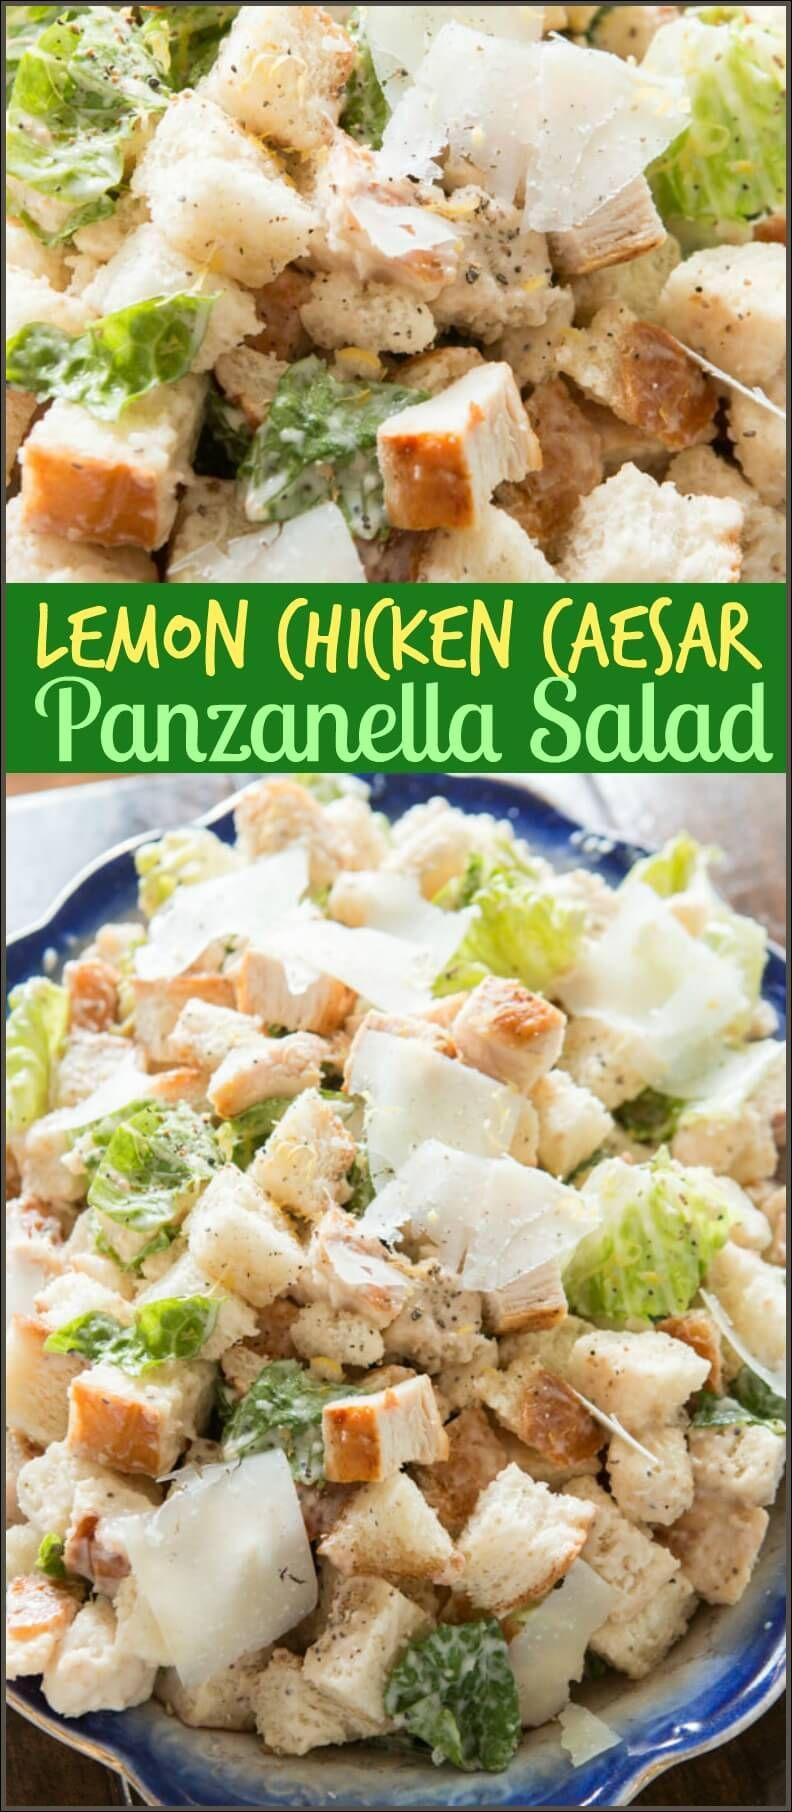 Lemon Chicken Caesar Panzanella Salad via @ohsweetbasil